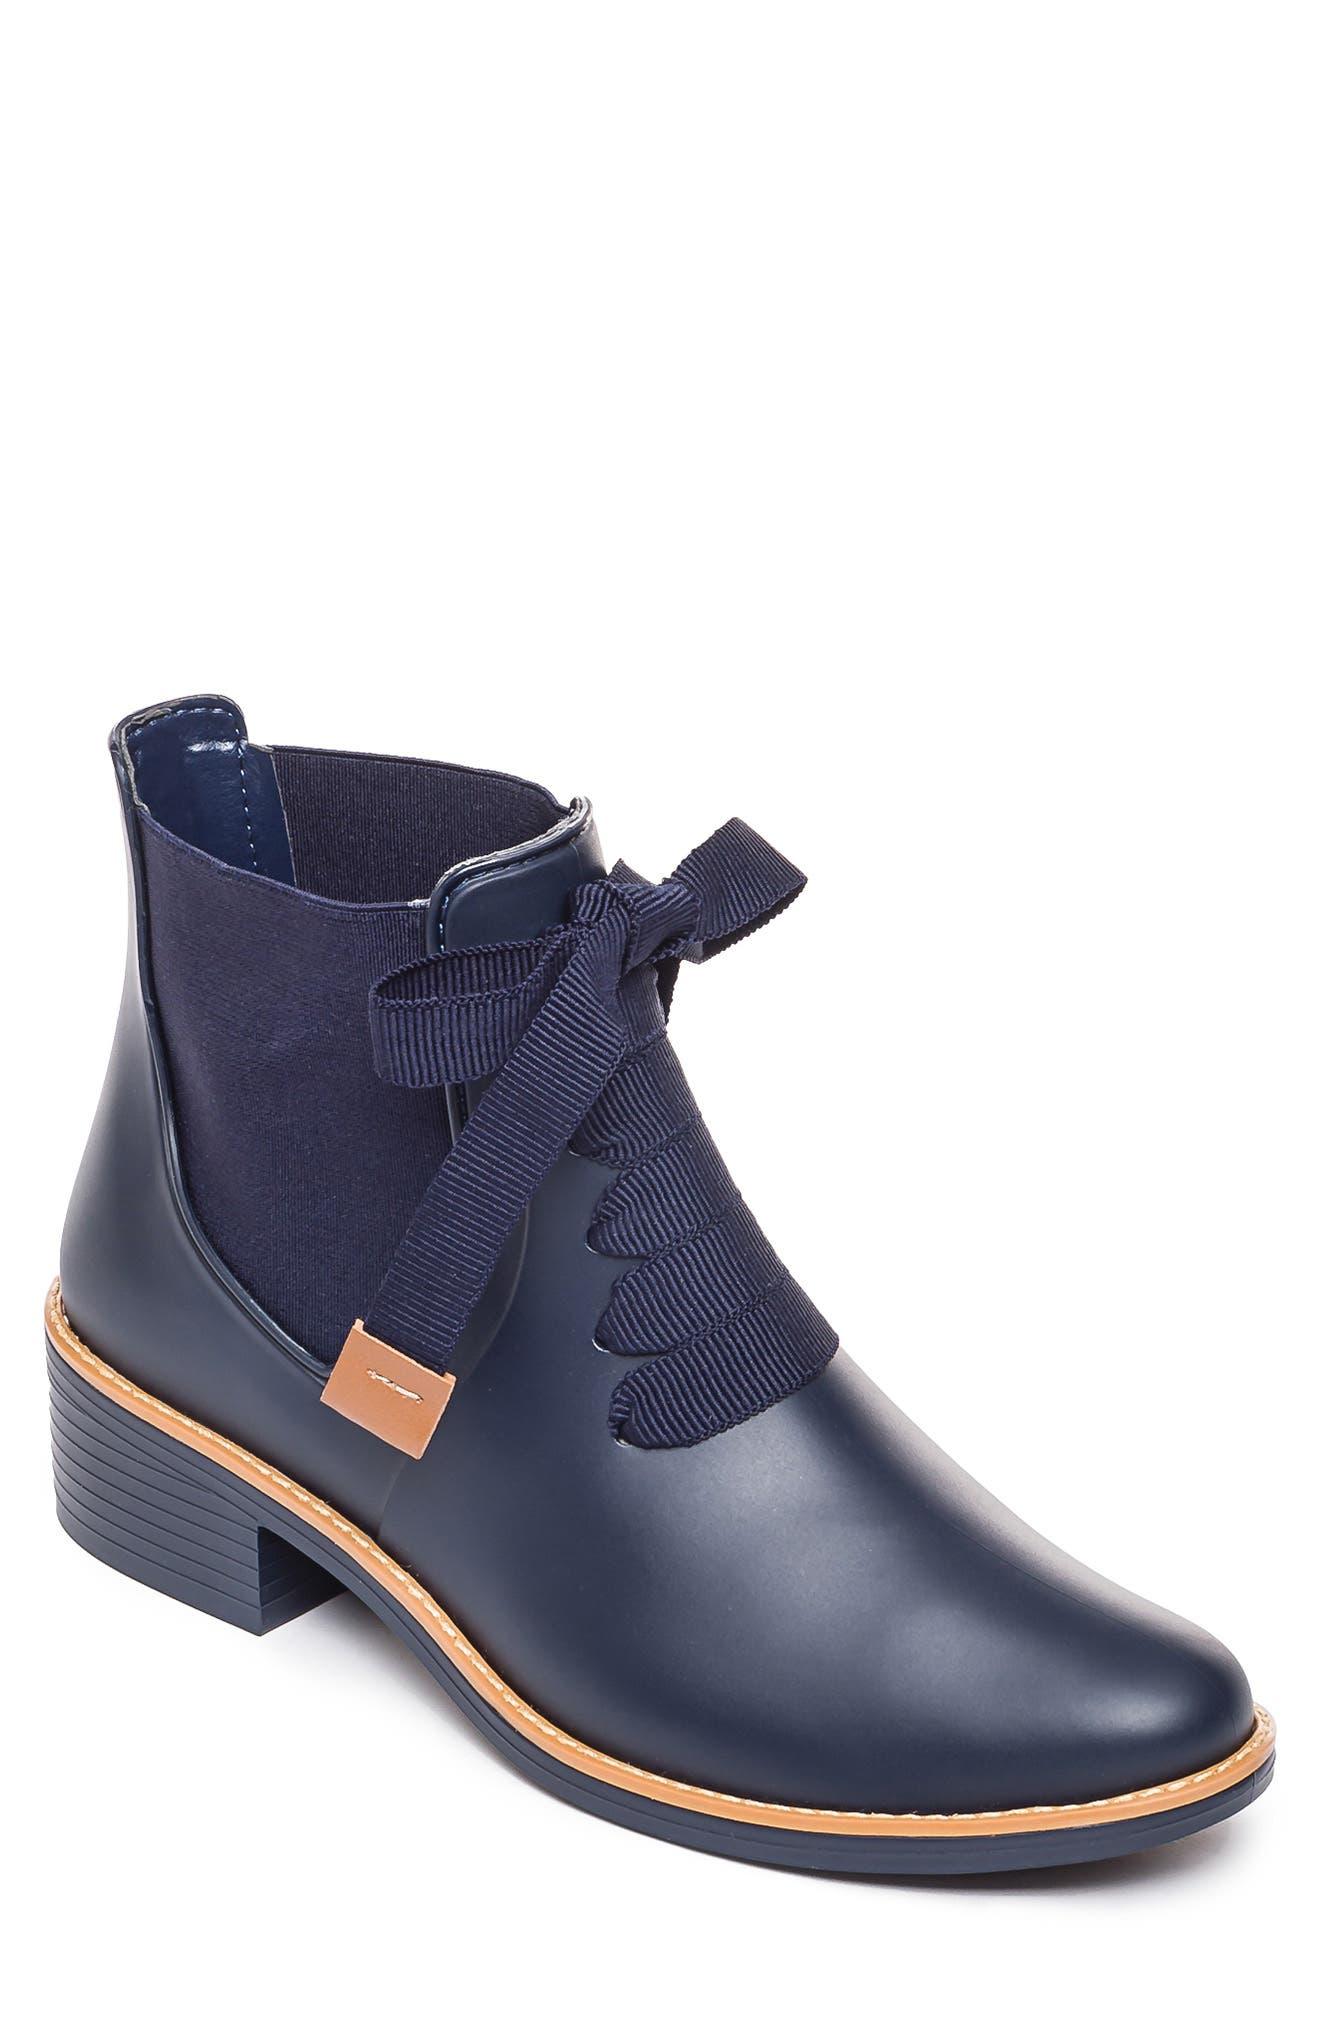 Lacey Short Waterproof Rain Boot